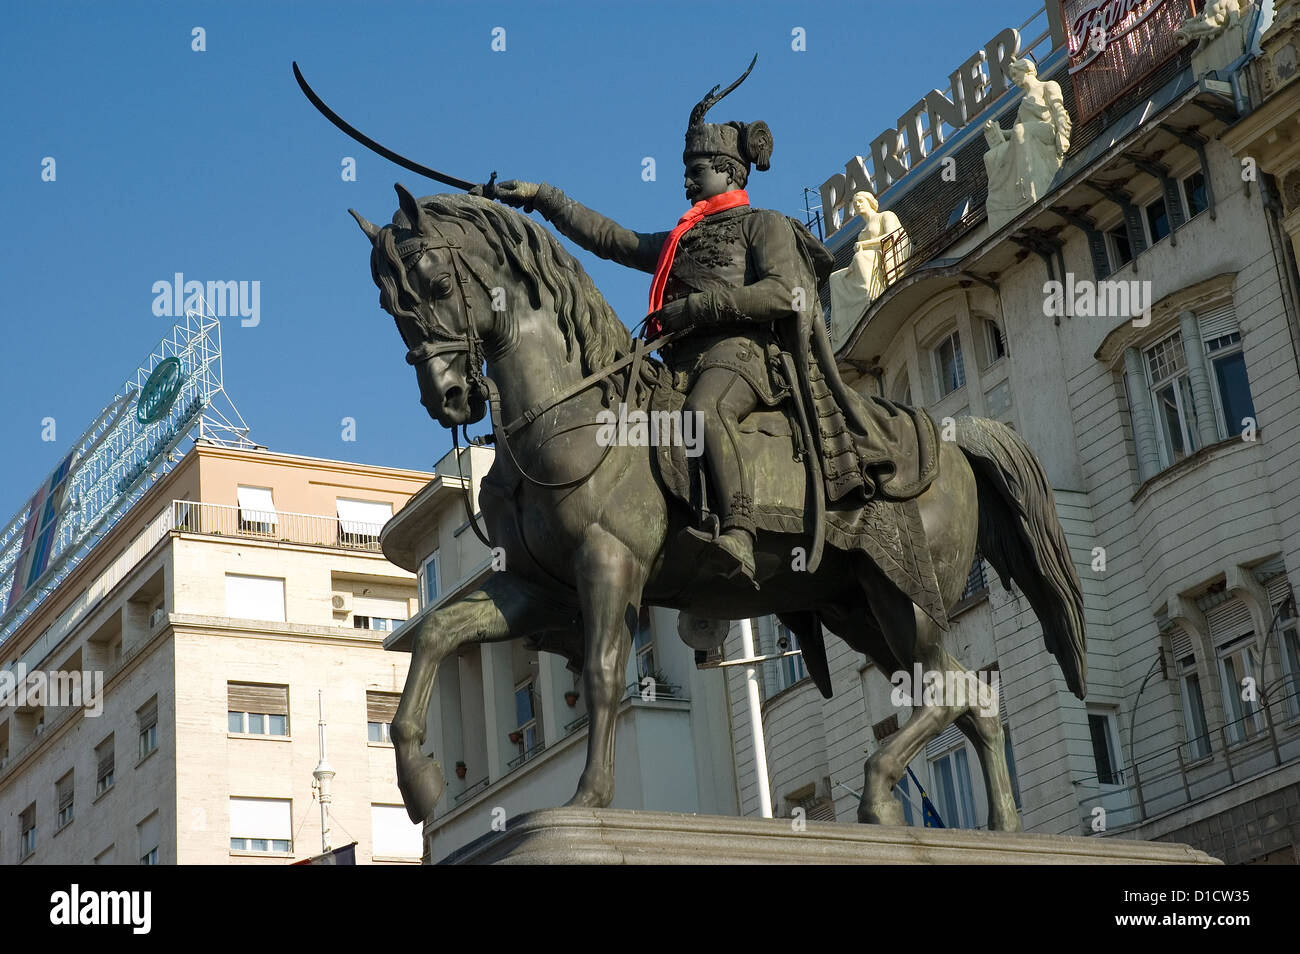 Elk192-1034 Croatia, Zagreb, Ban Josip Jelacica statue Stock Photo